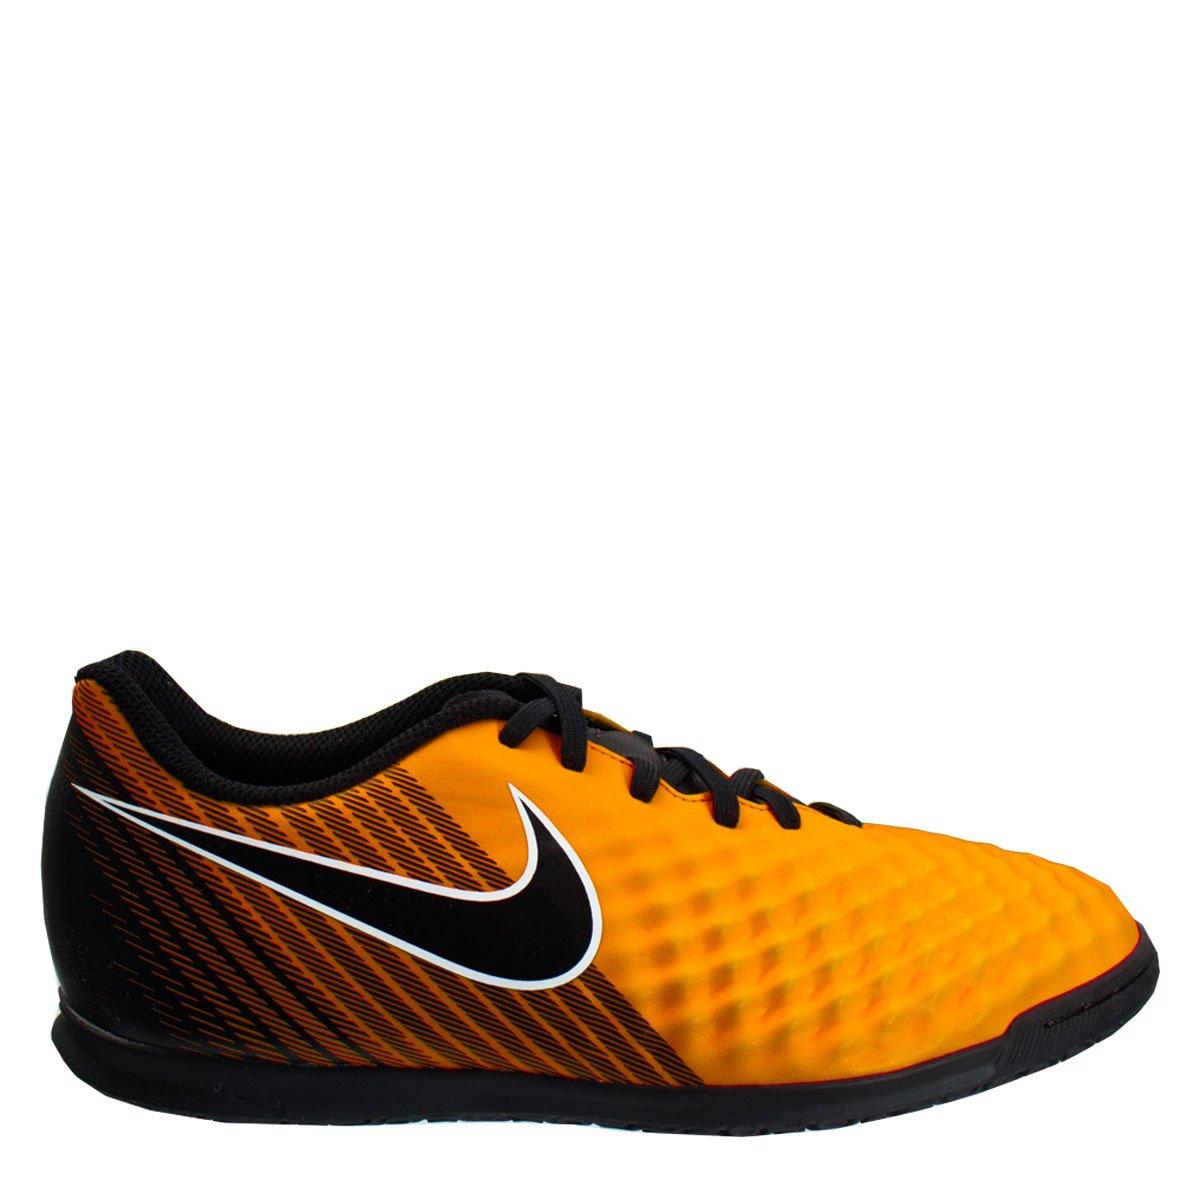 Bizz Store - Chuteira de Futsal Masculina Nike Magista Ola II IC b6d76d49e46fc